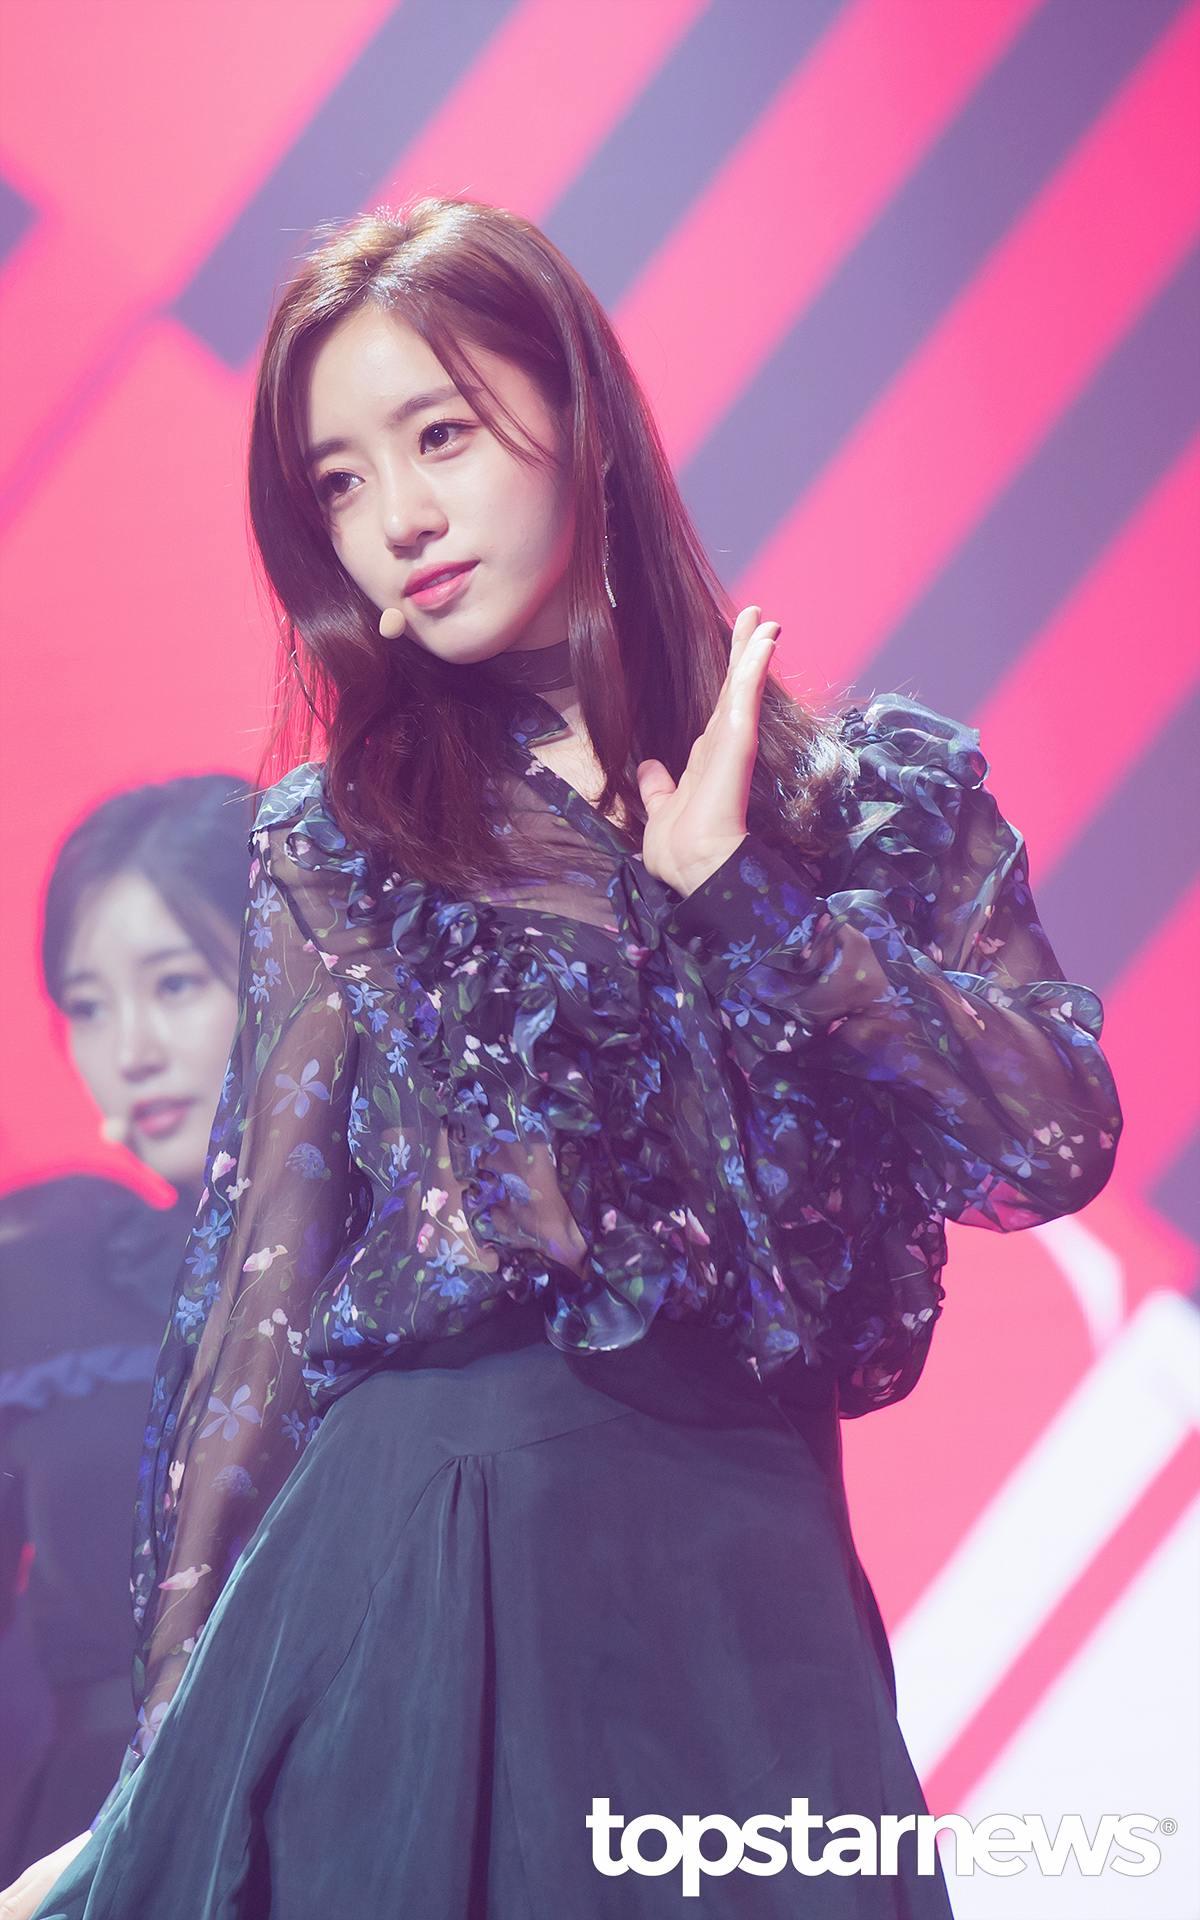 EunJung:發生了和榮(前成員花英)的事情, 對我們來說 T-ARA的形象也發生了變化, 因為度過了很辛苦的時間,所以會永遠記在心上警惕自己。 現在就算看到和榮也可以笑著打招呼